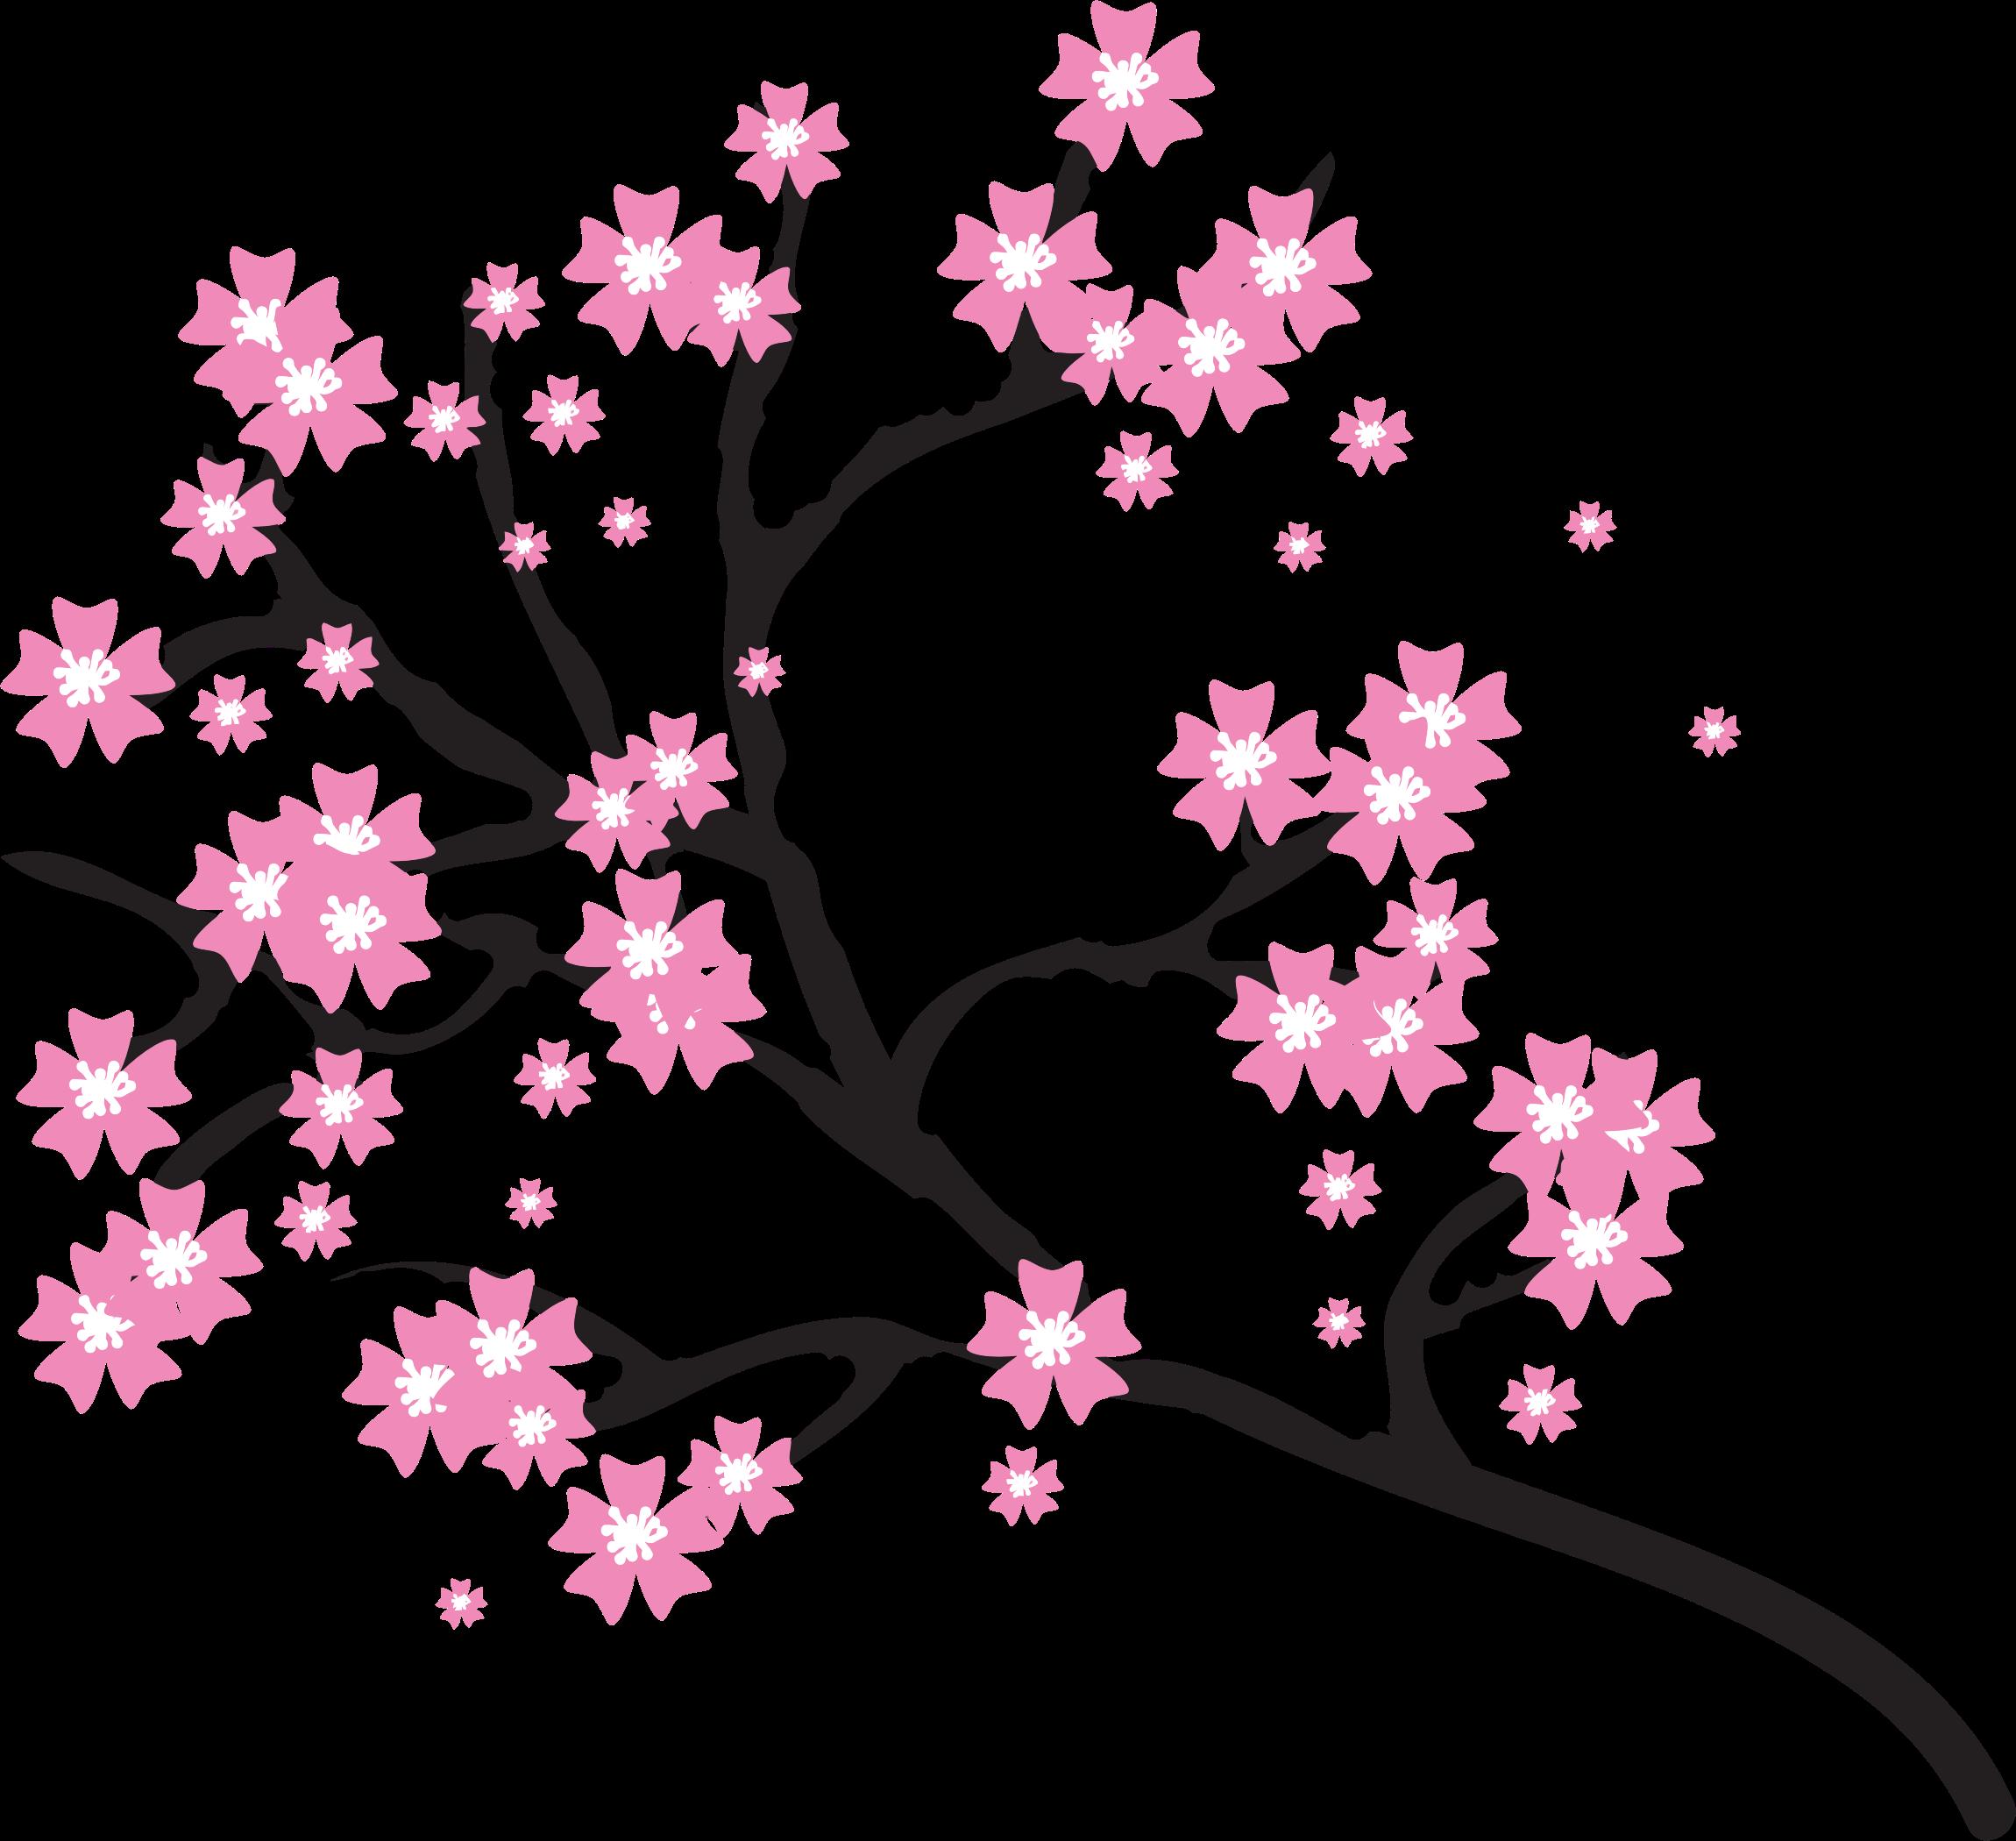 Sakura flower clipart picture black and white library Clipart - Cherry Blossoms picture black and white library